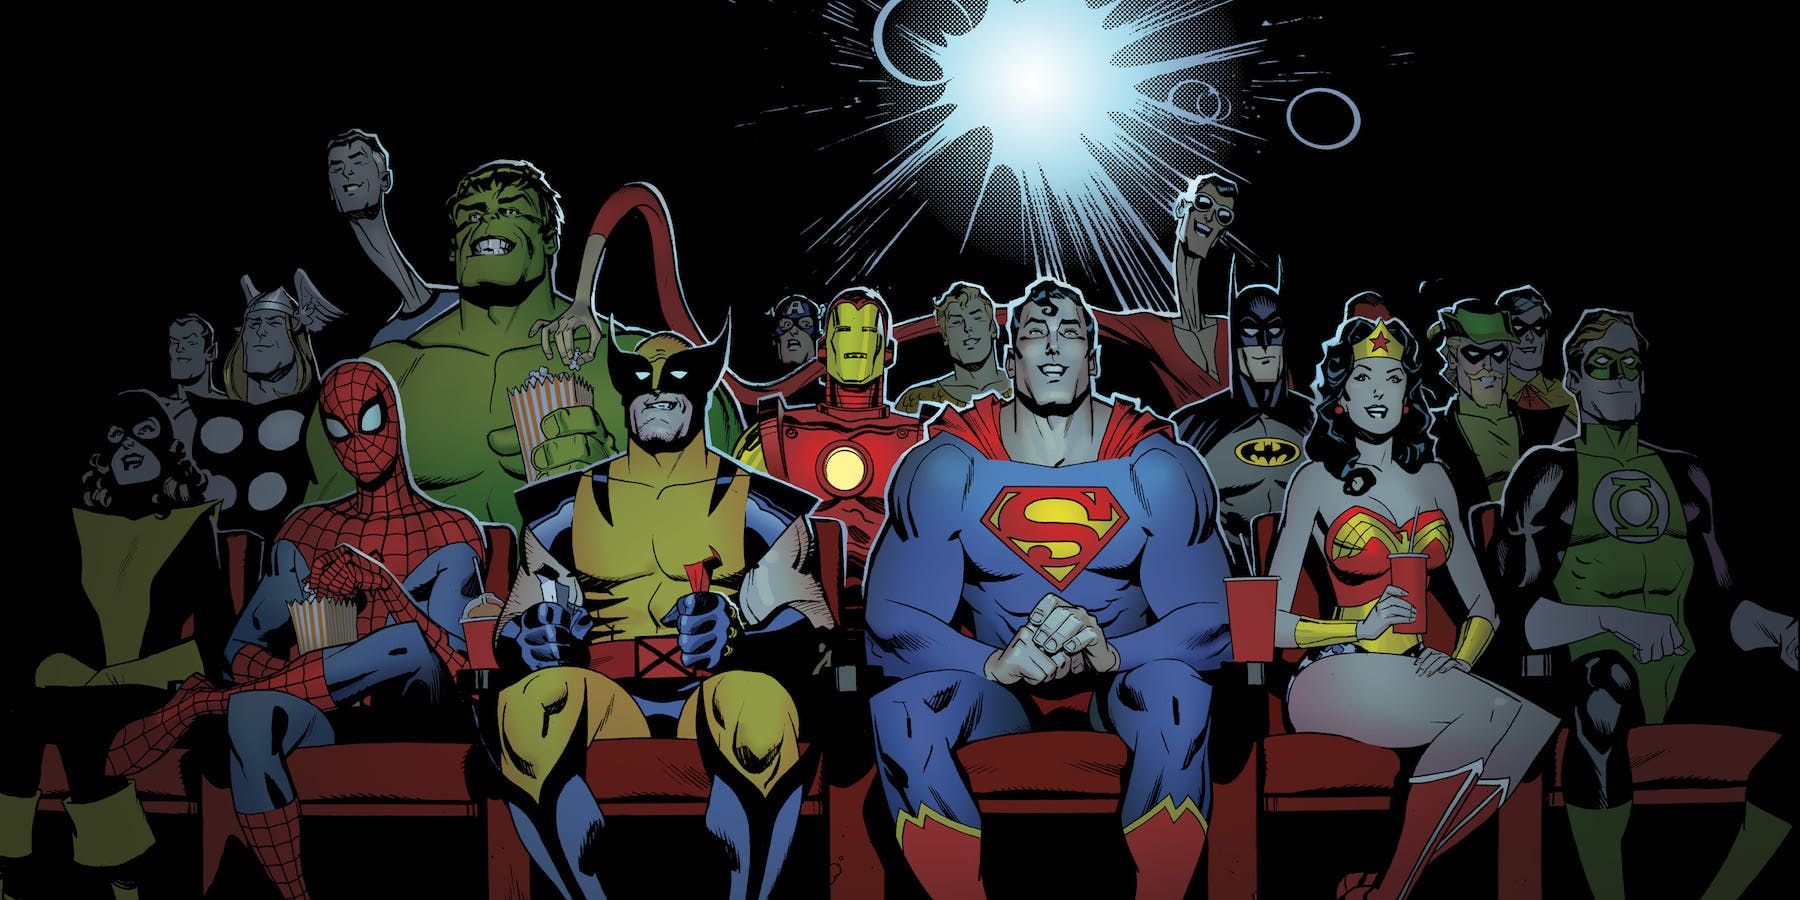 Marvel-DC-Comics-Superheroes.jpg